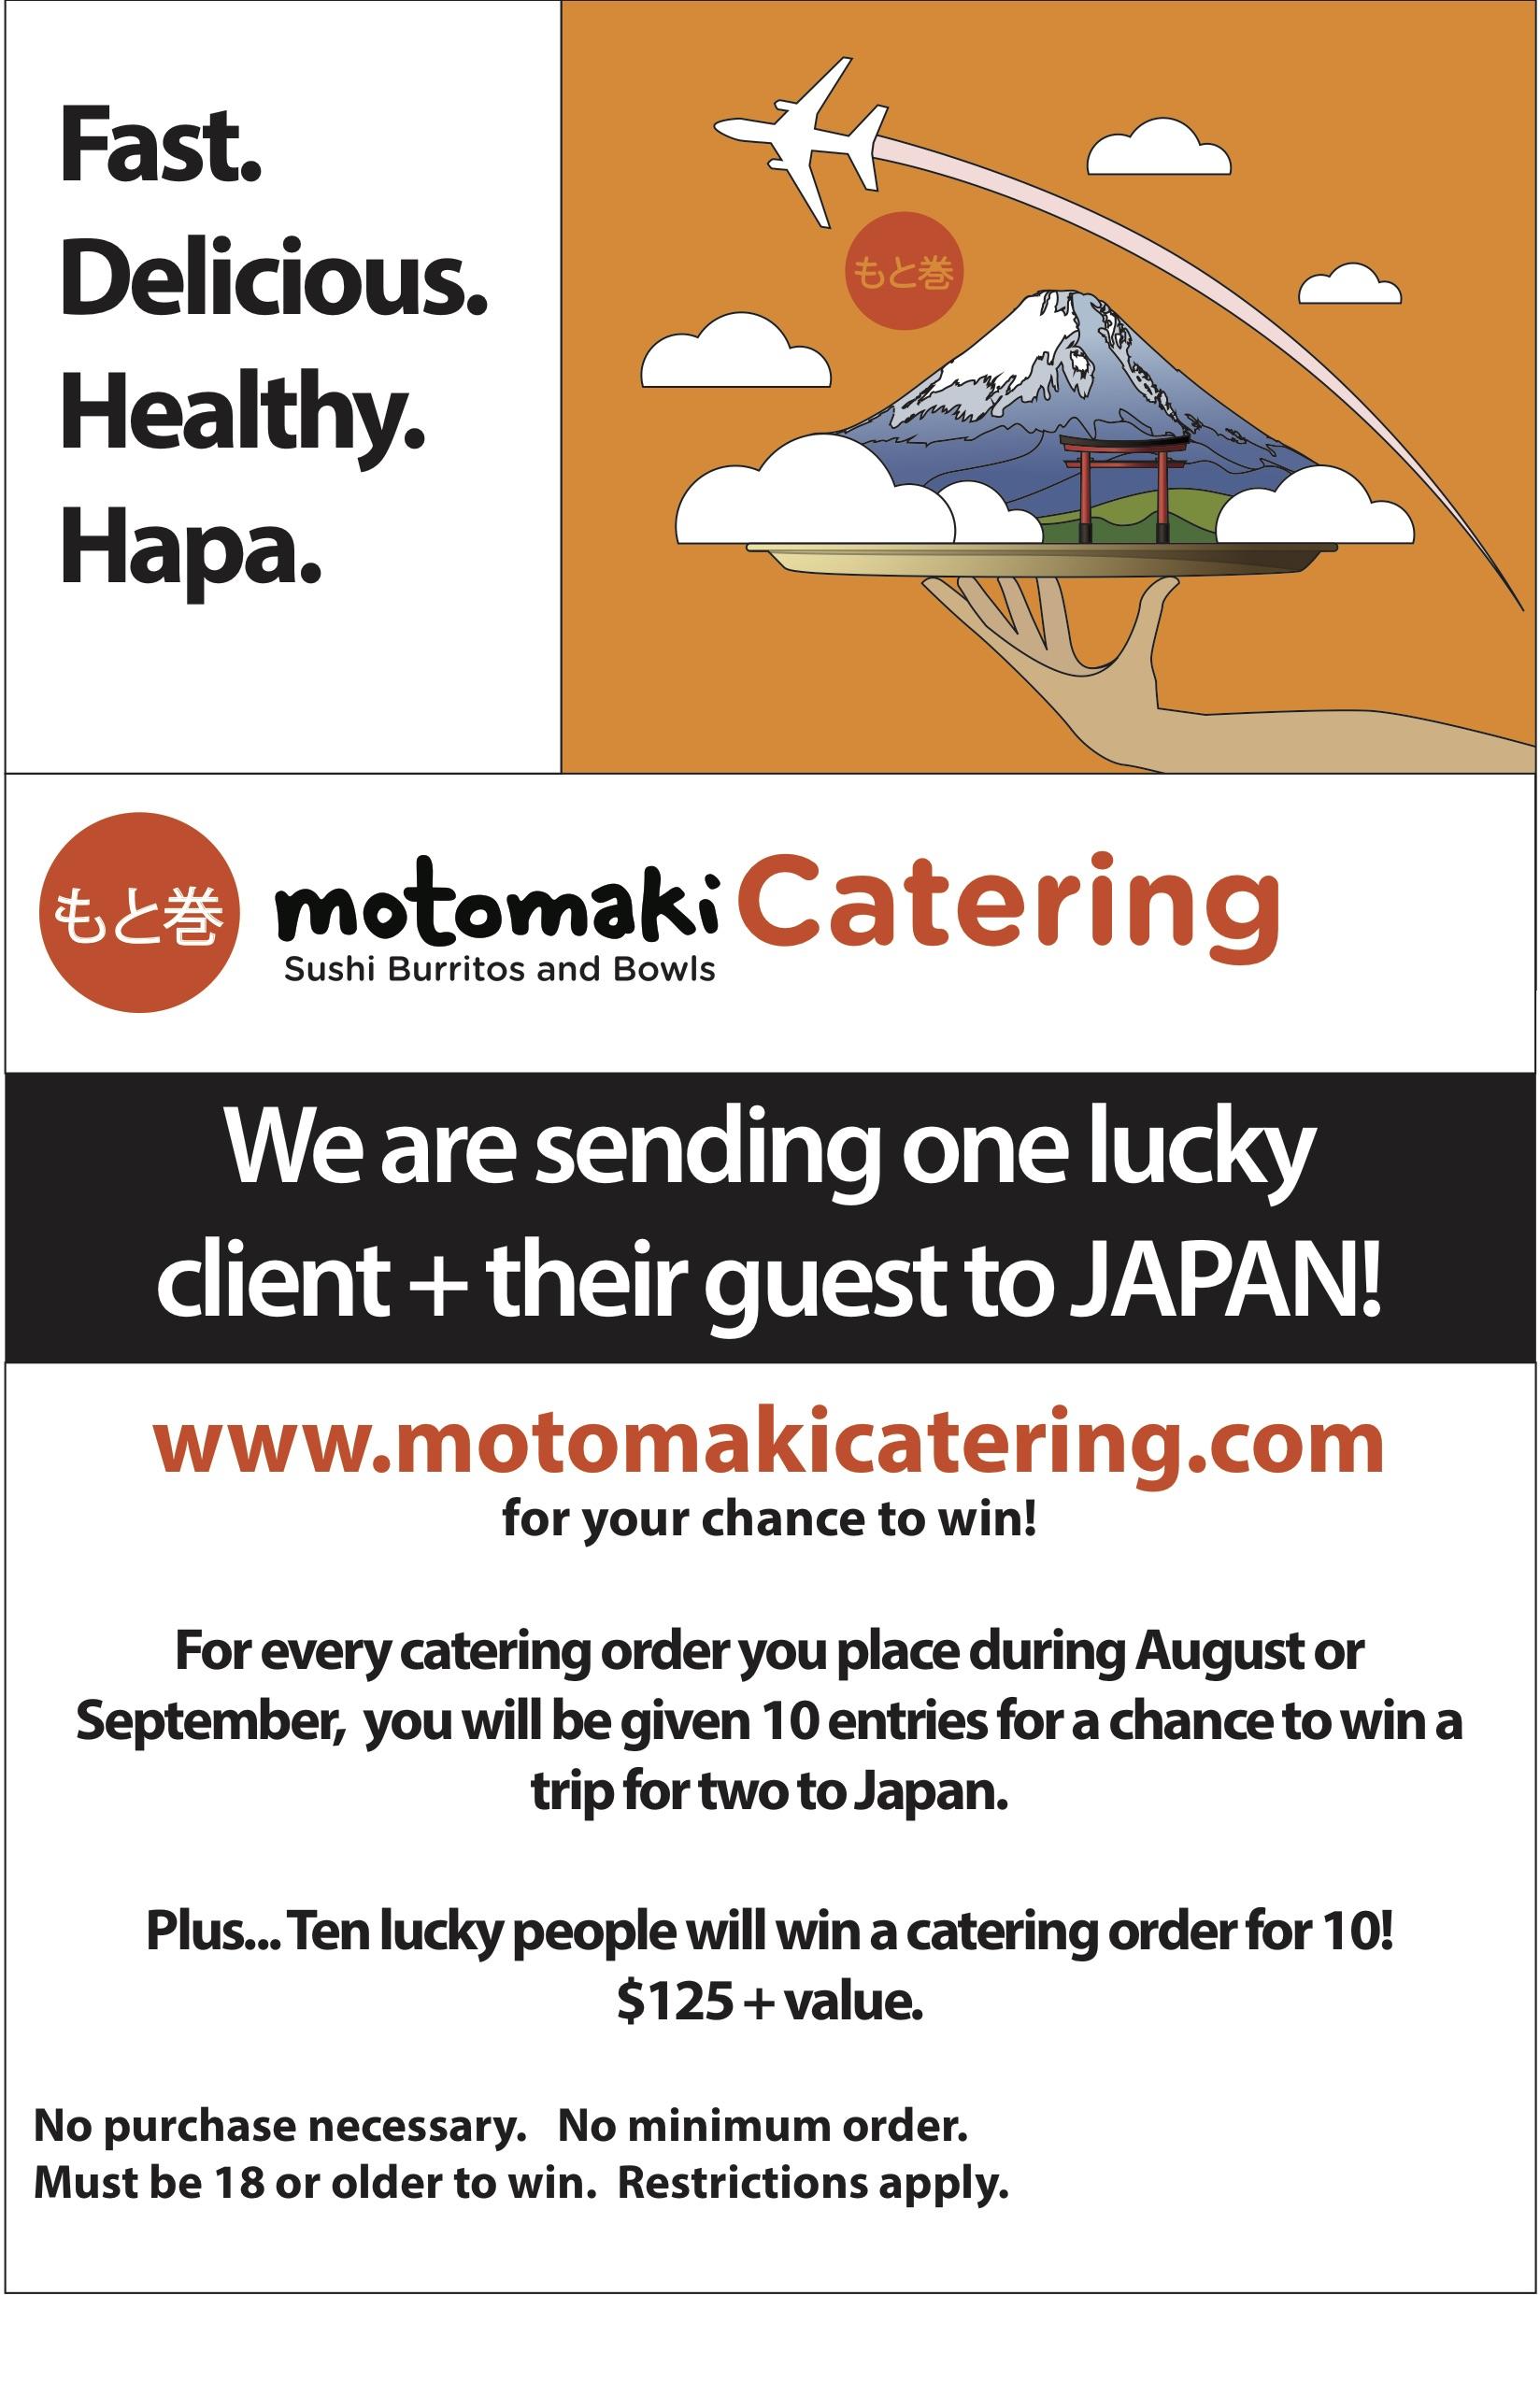 motomaki free trip to japan